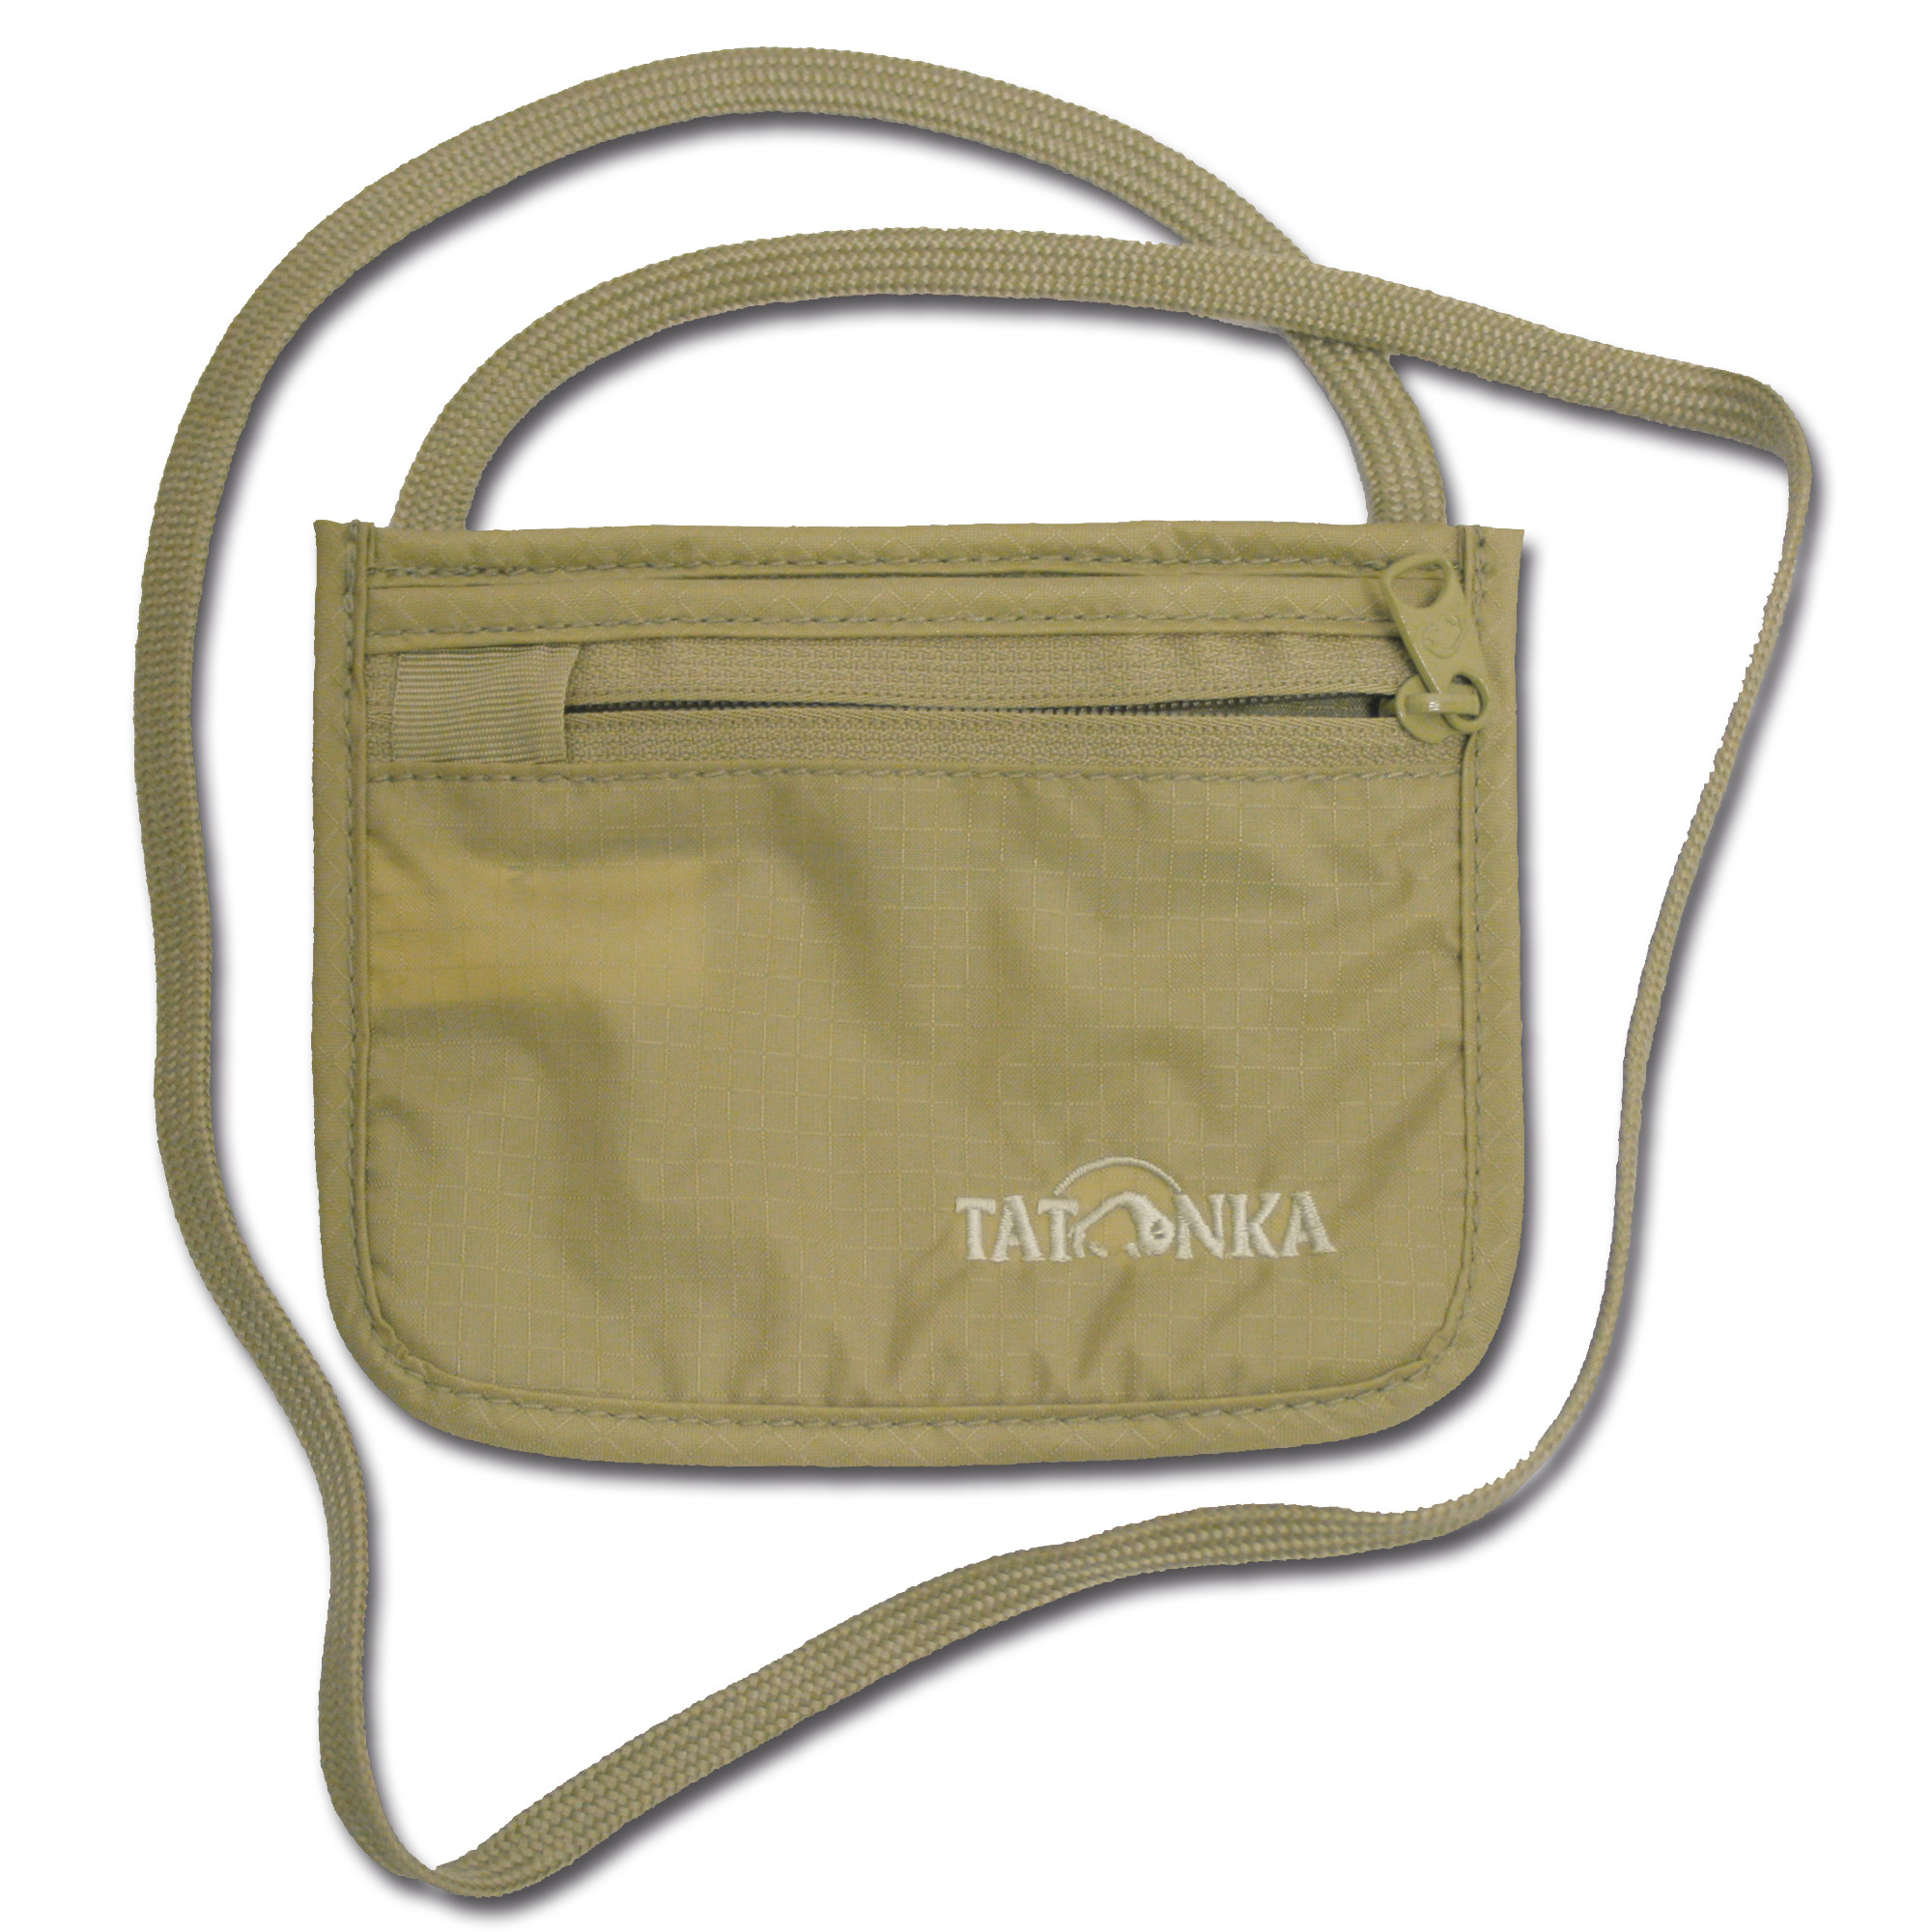 Tatonka Skin porta documentos natural